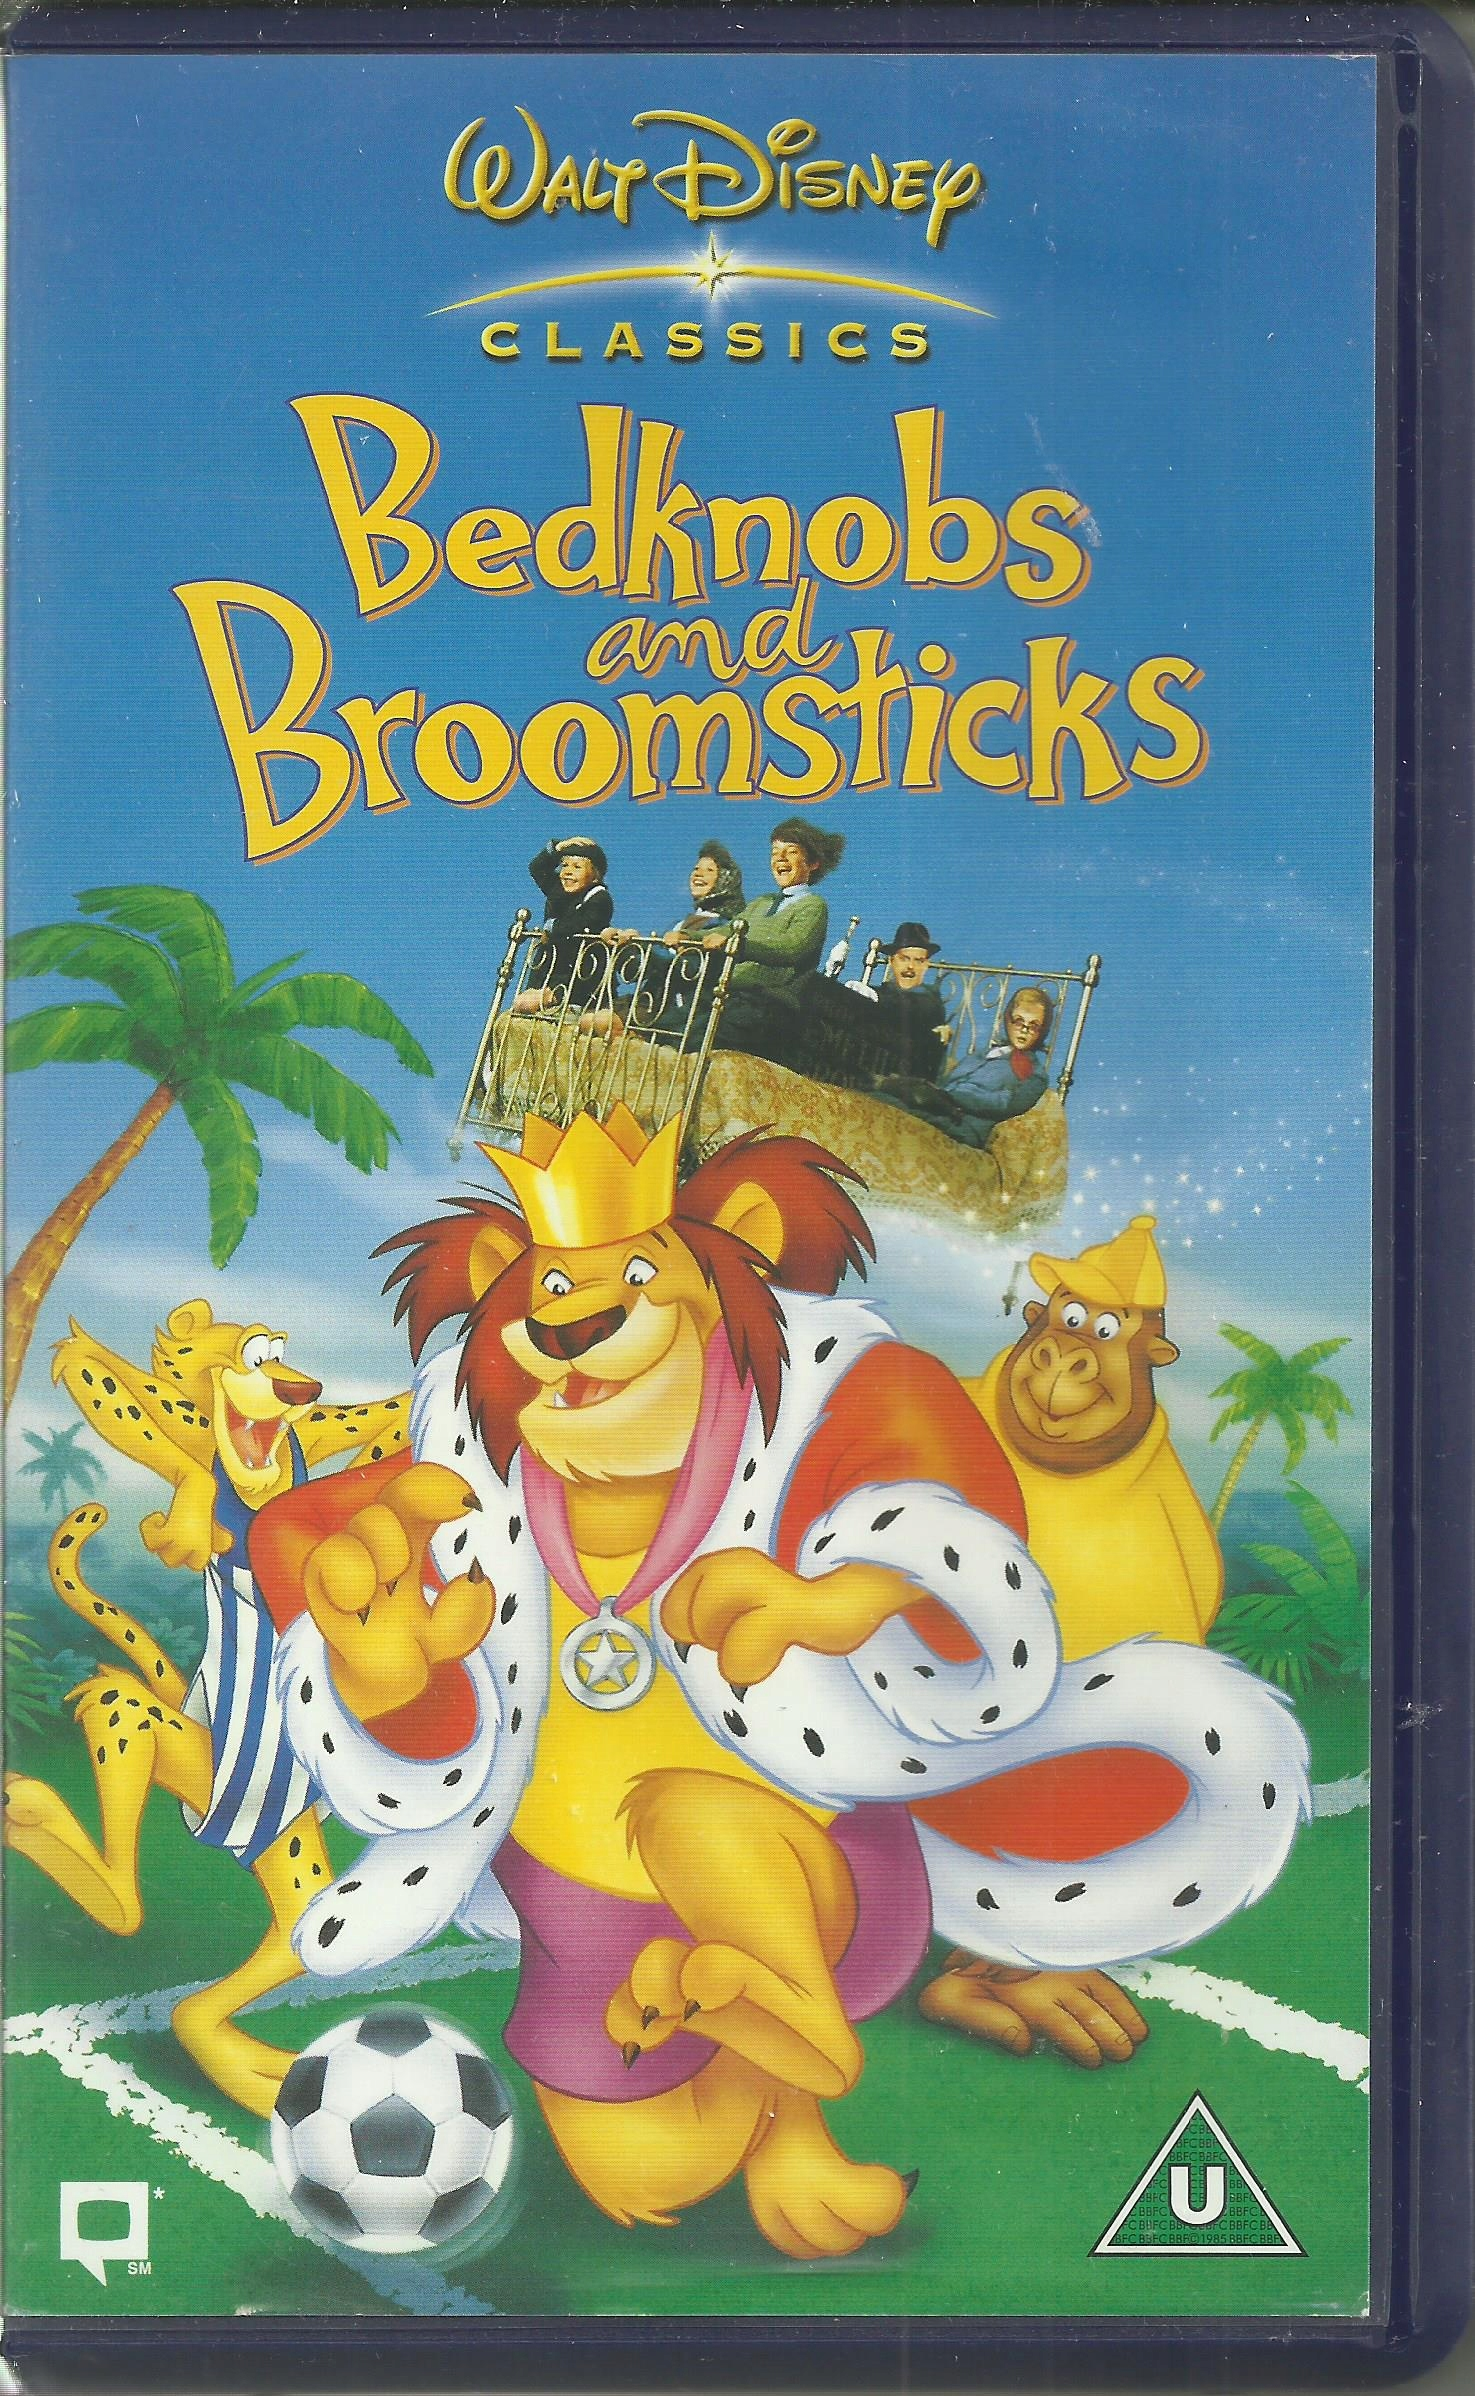 Bedknobs And Broomsticks Gałki Od łóżka I Vhs